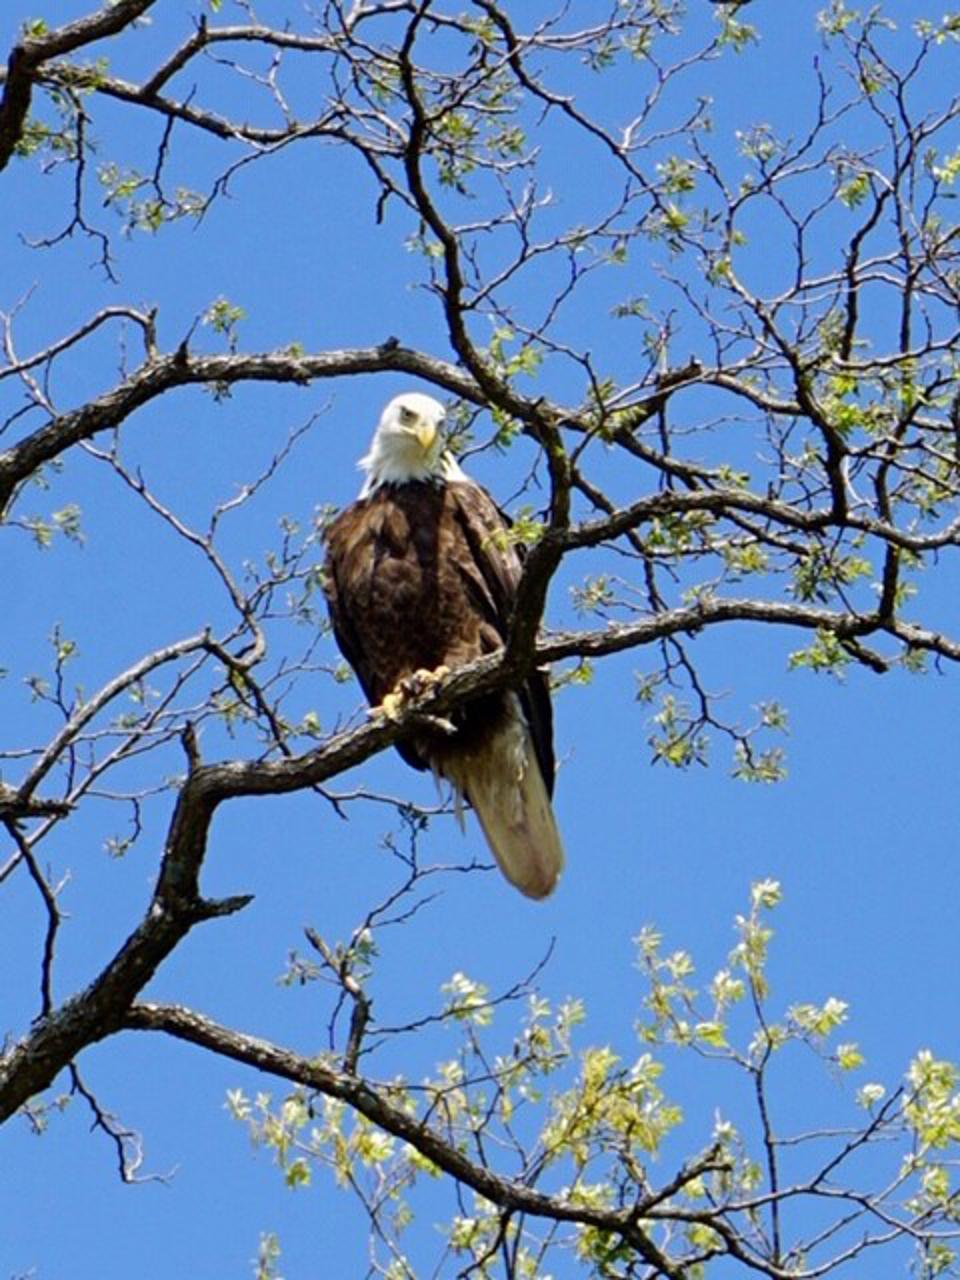 Bald eagle sitting in a tree near Dogwood Canyon in Branson, MO